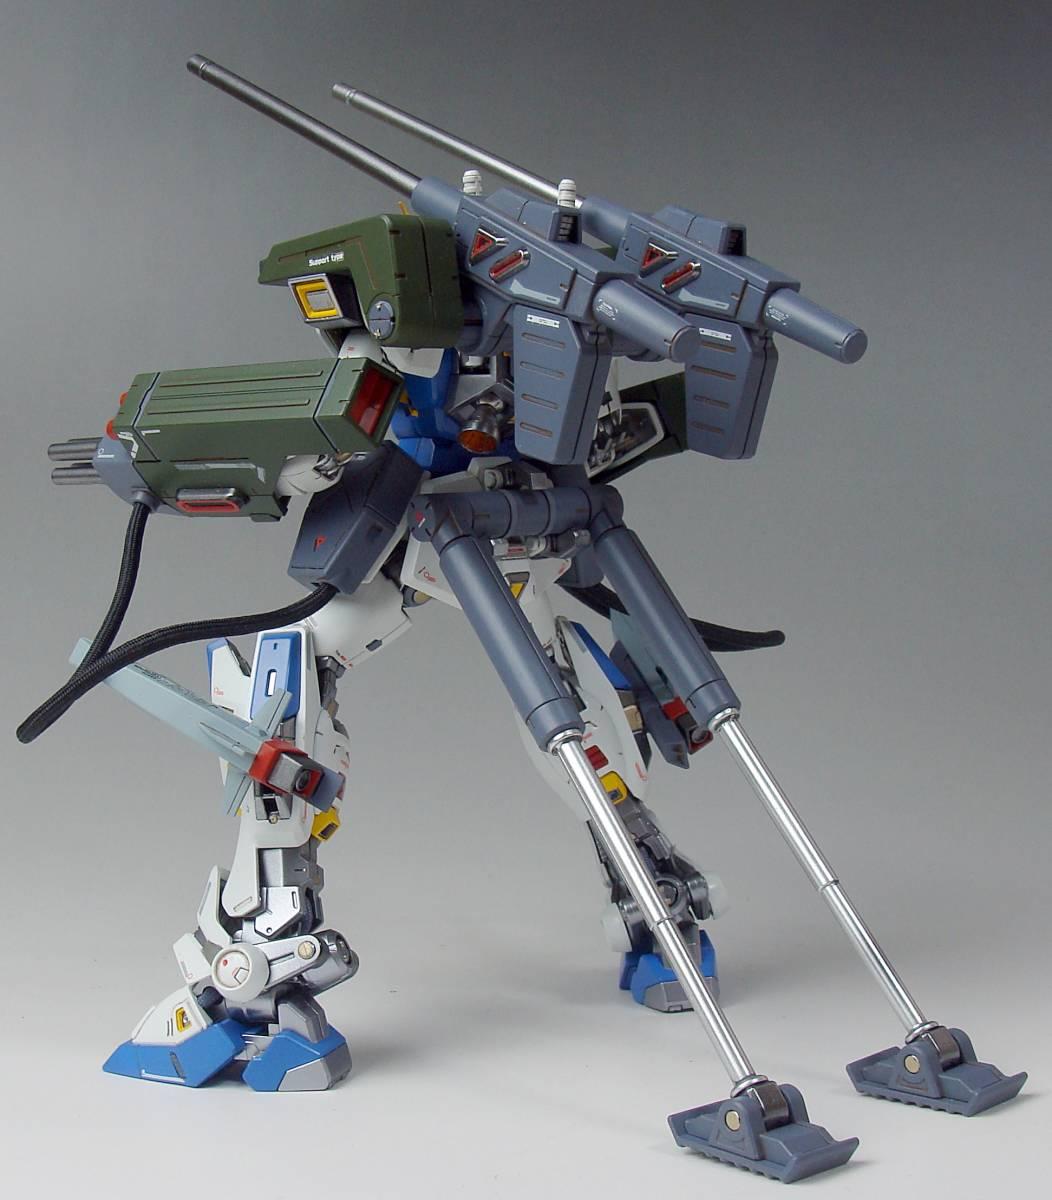 1/100 MG ガンダムF90+ミッションパックE&S型 改造塗装済み完成品_画像7